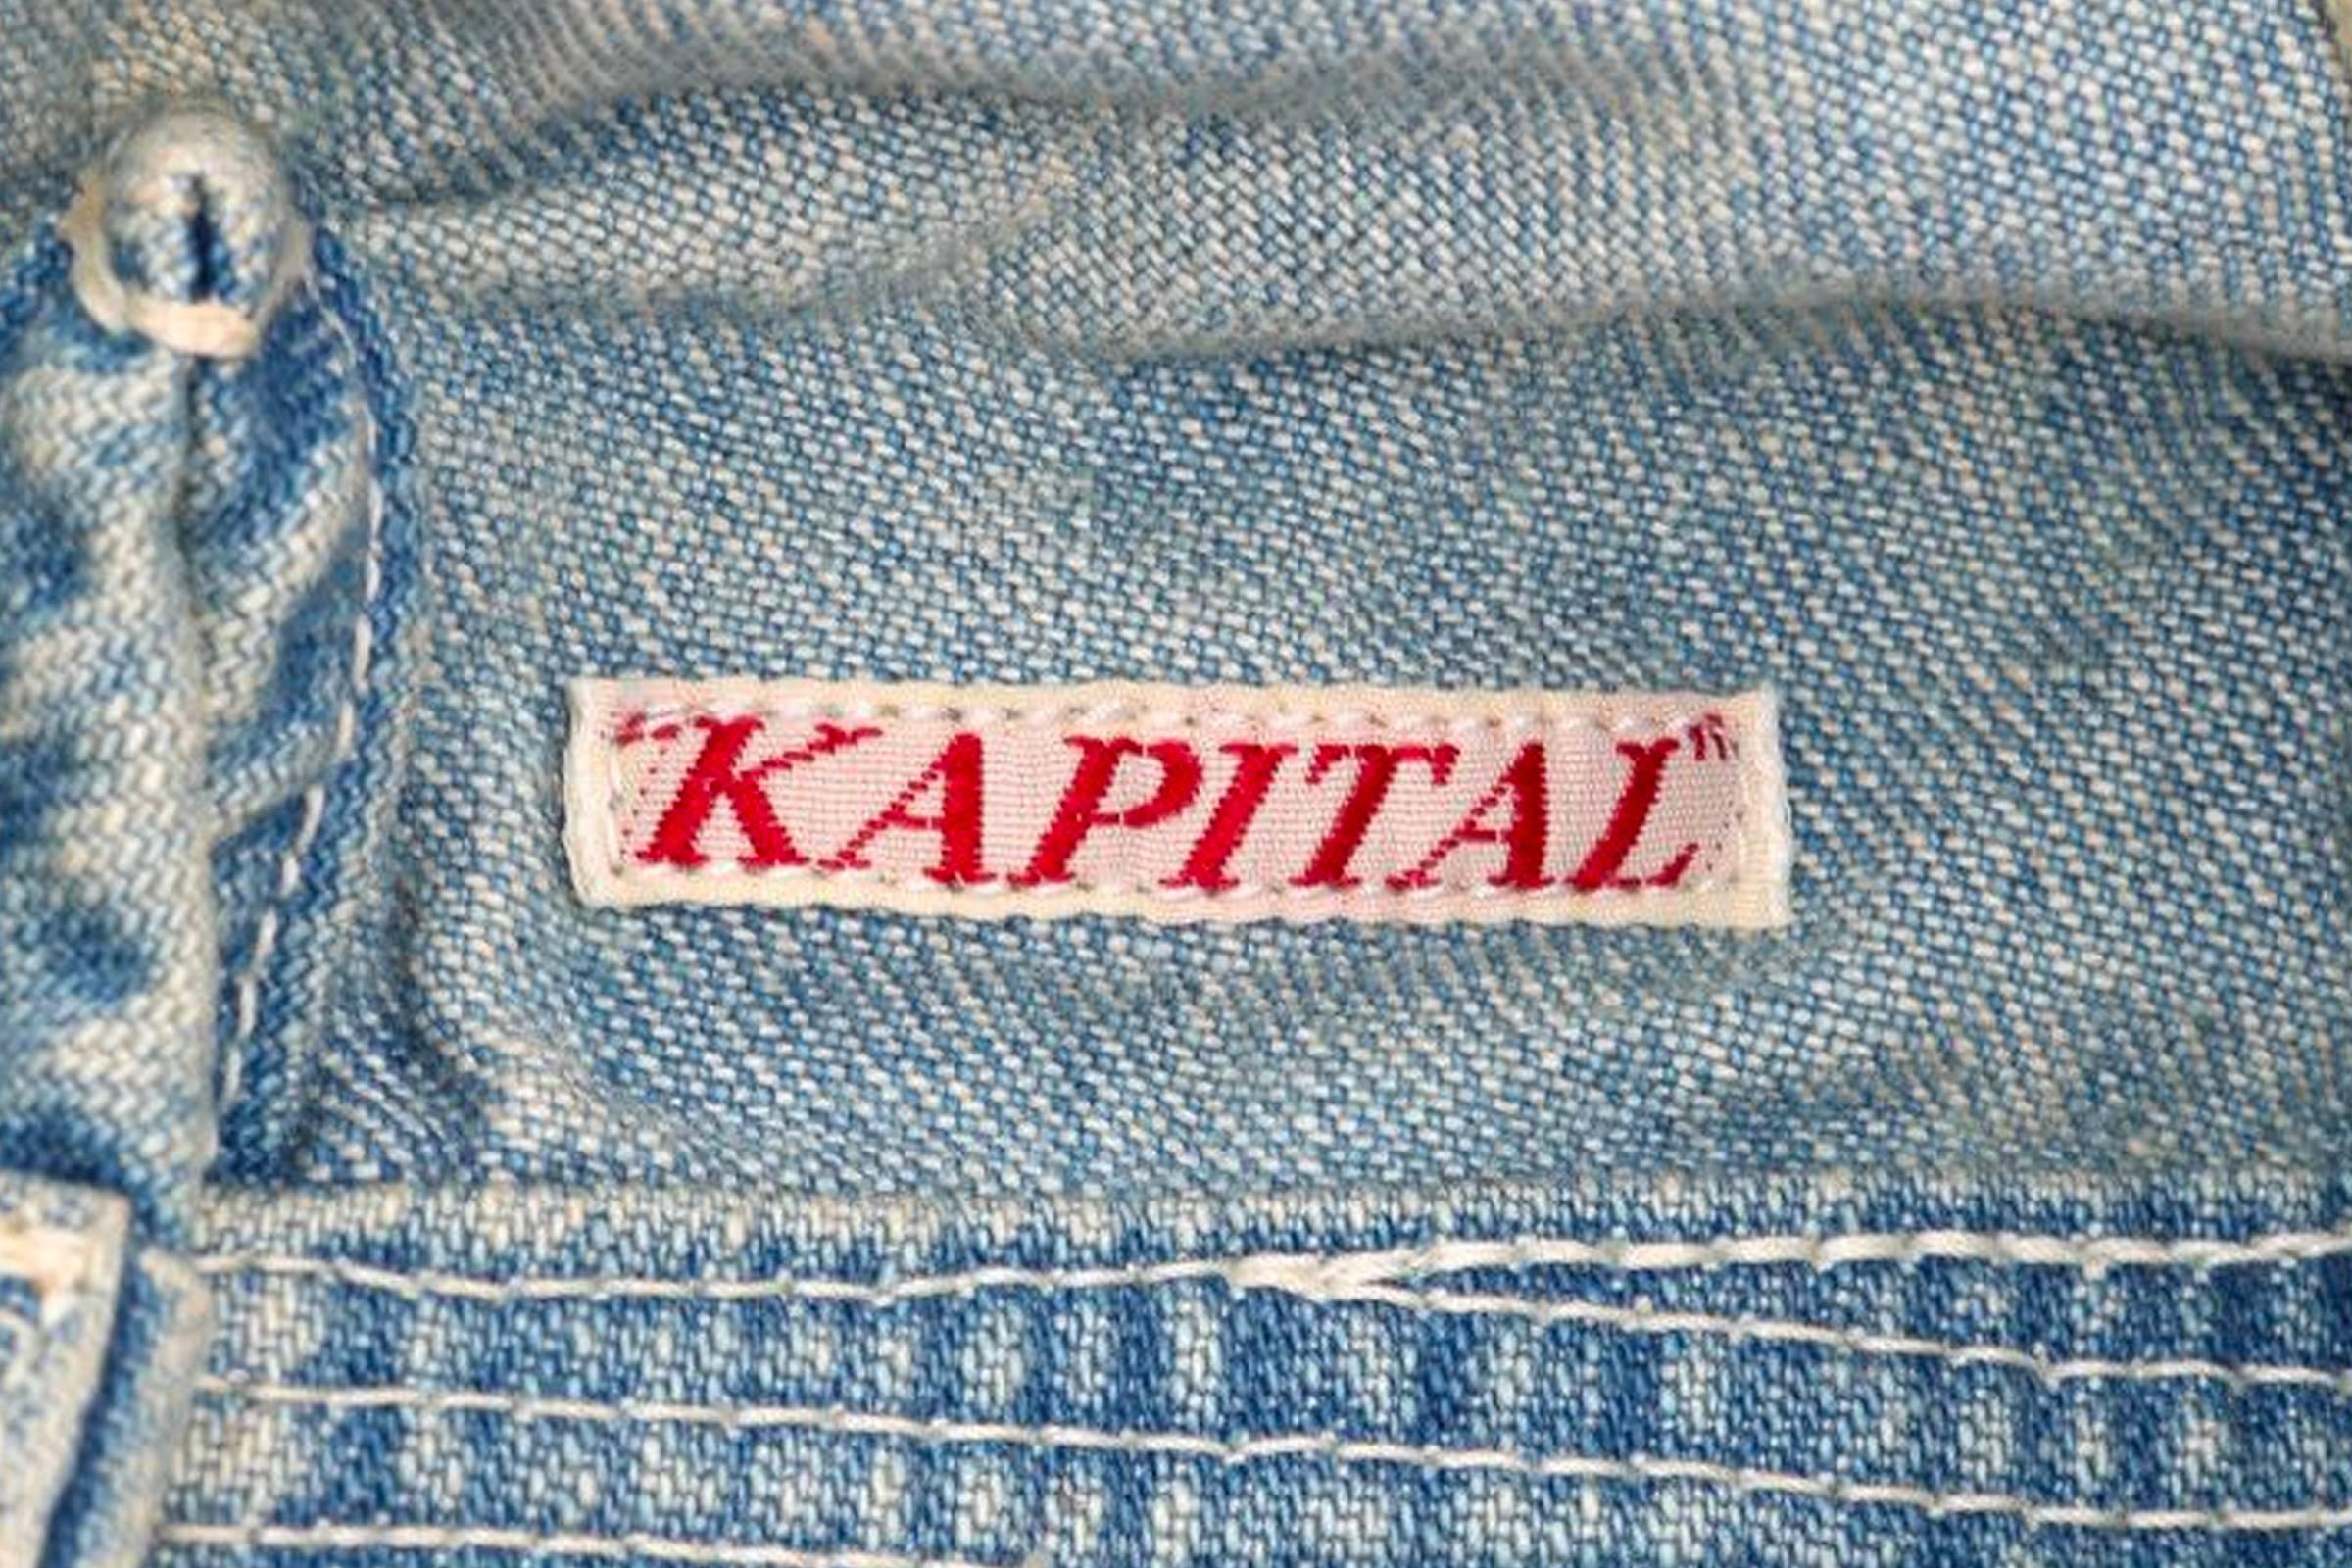 What Are Kapital and Kapital Kountry?